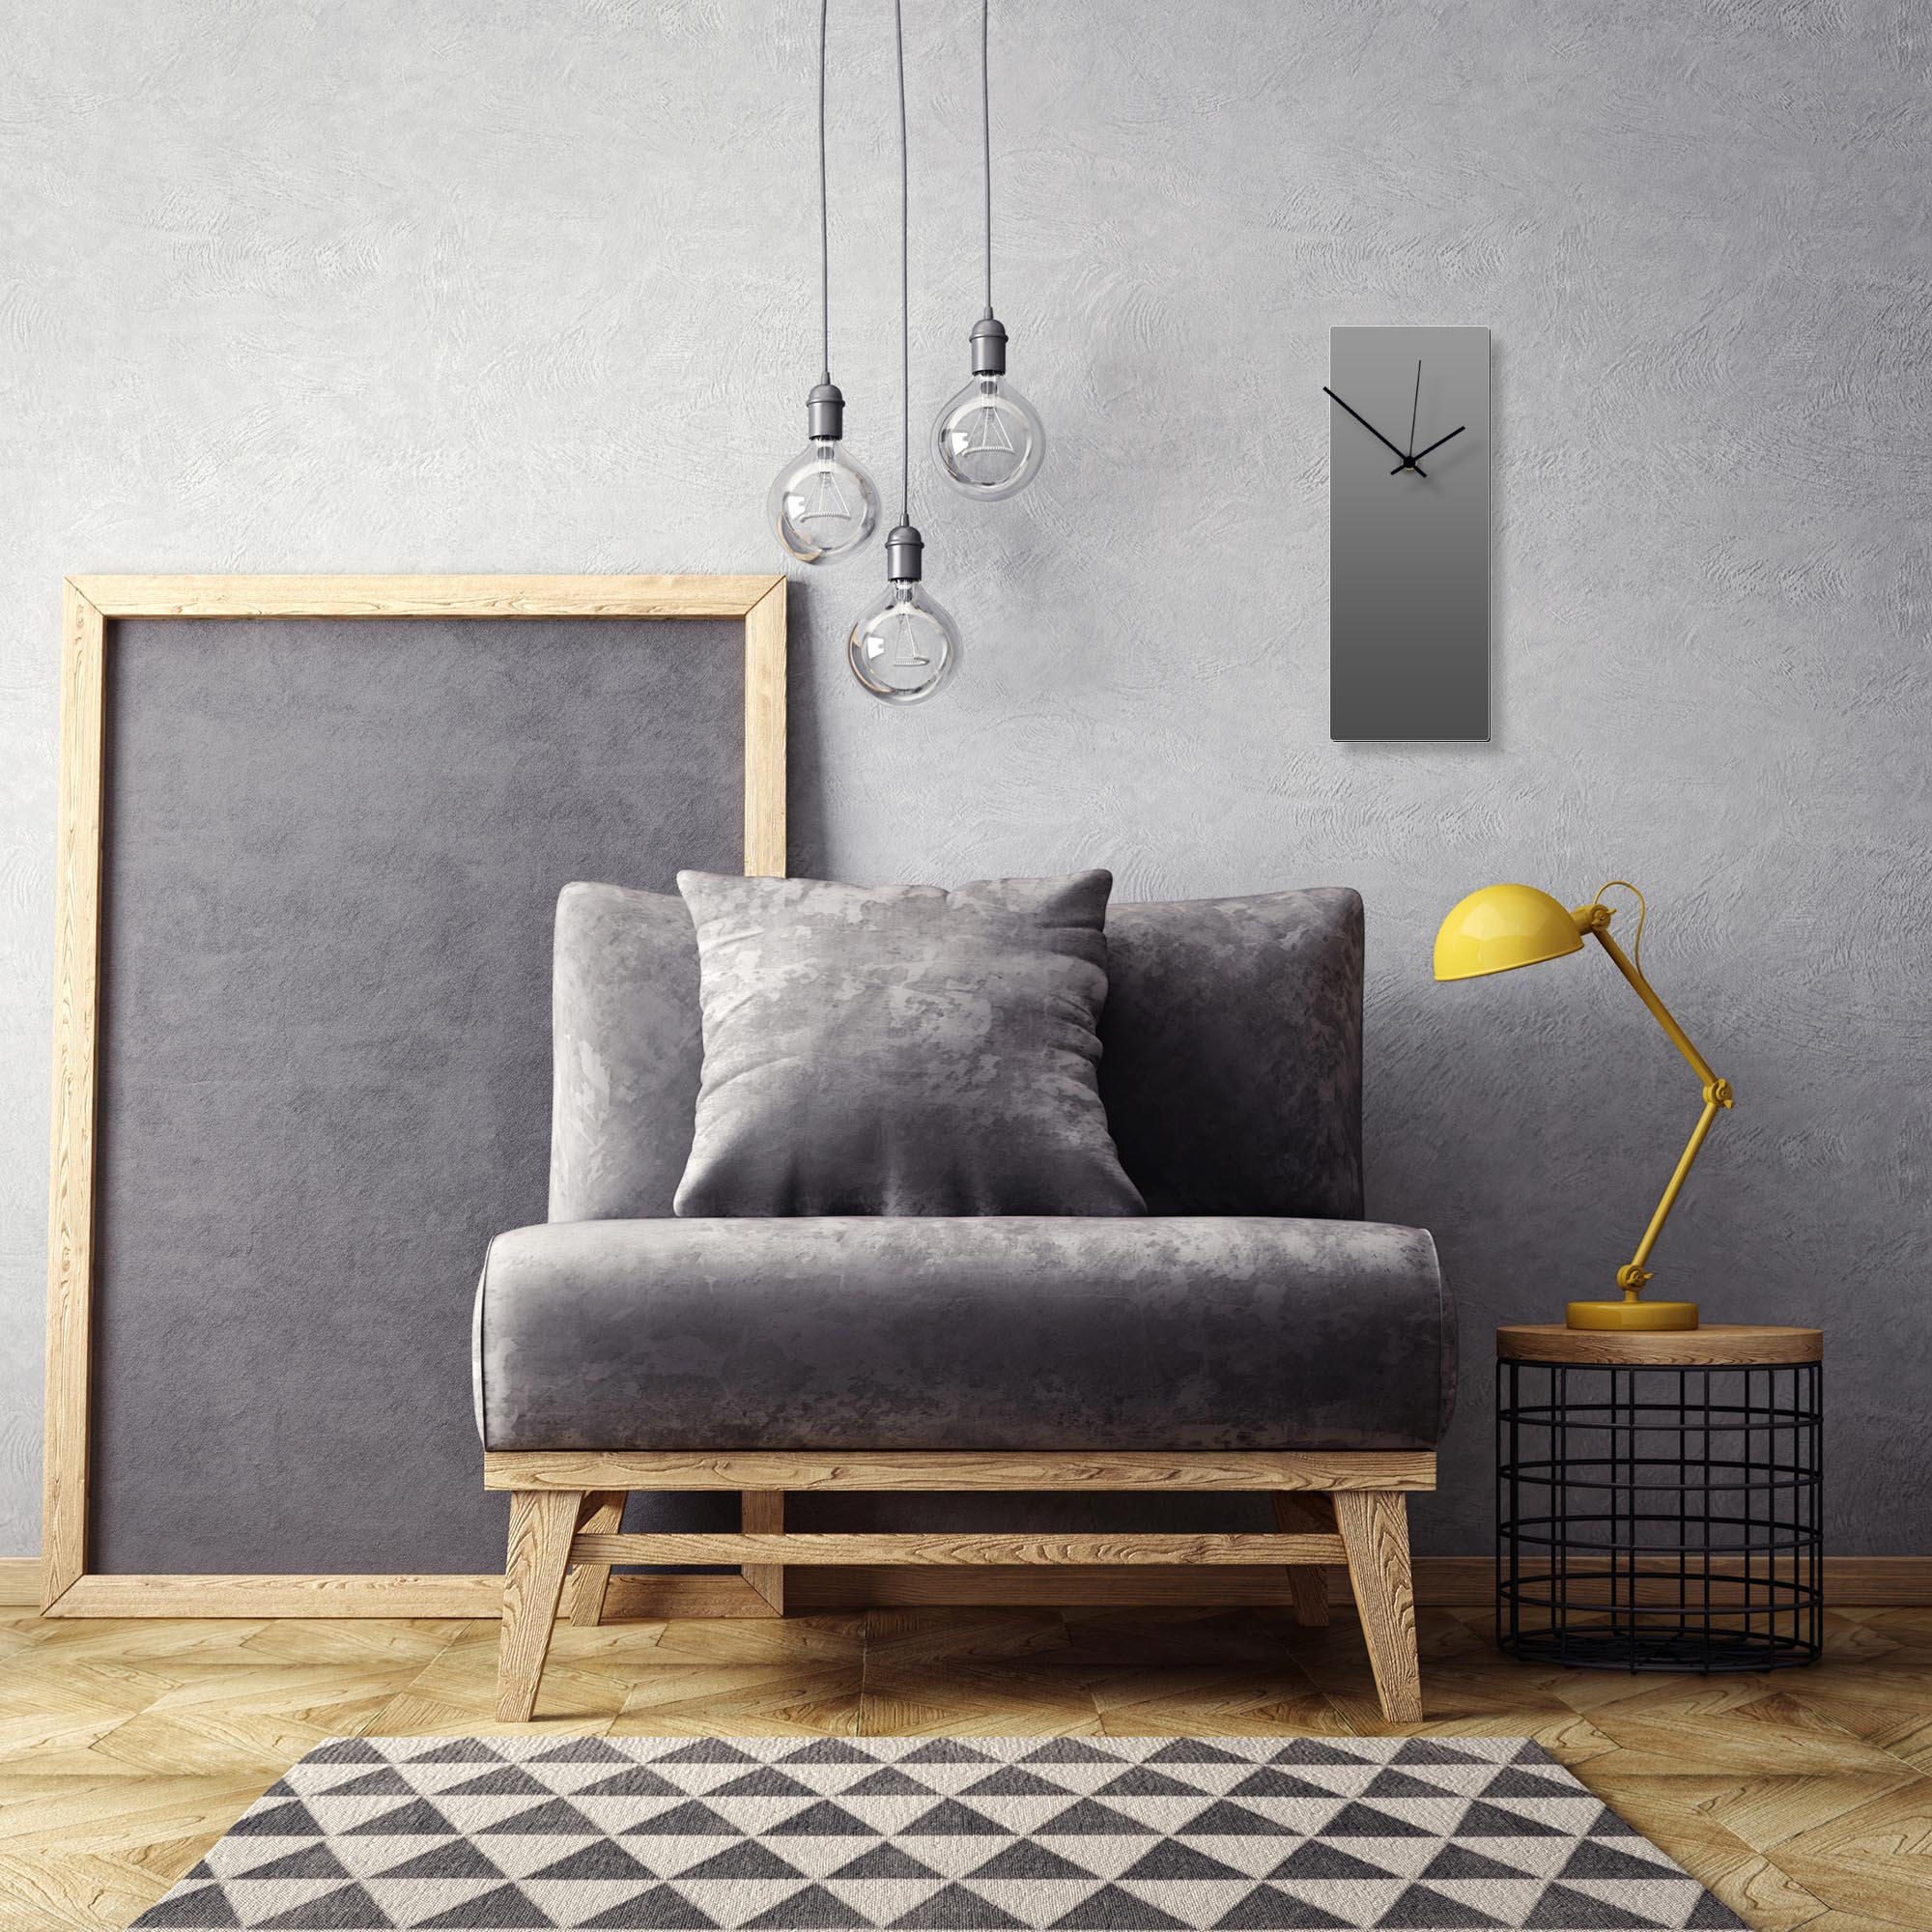 Grayout Black Clock by Adam Schwoeppe Contemporary Clock on Aluminum Polymetal - Alternate View 1